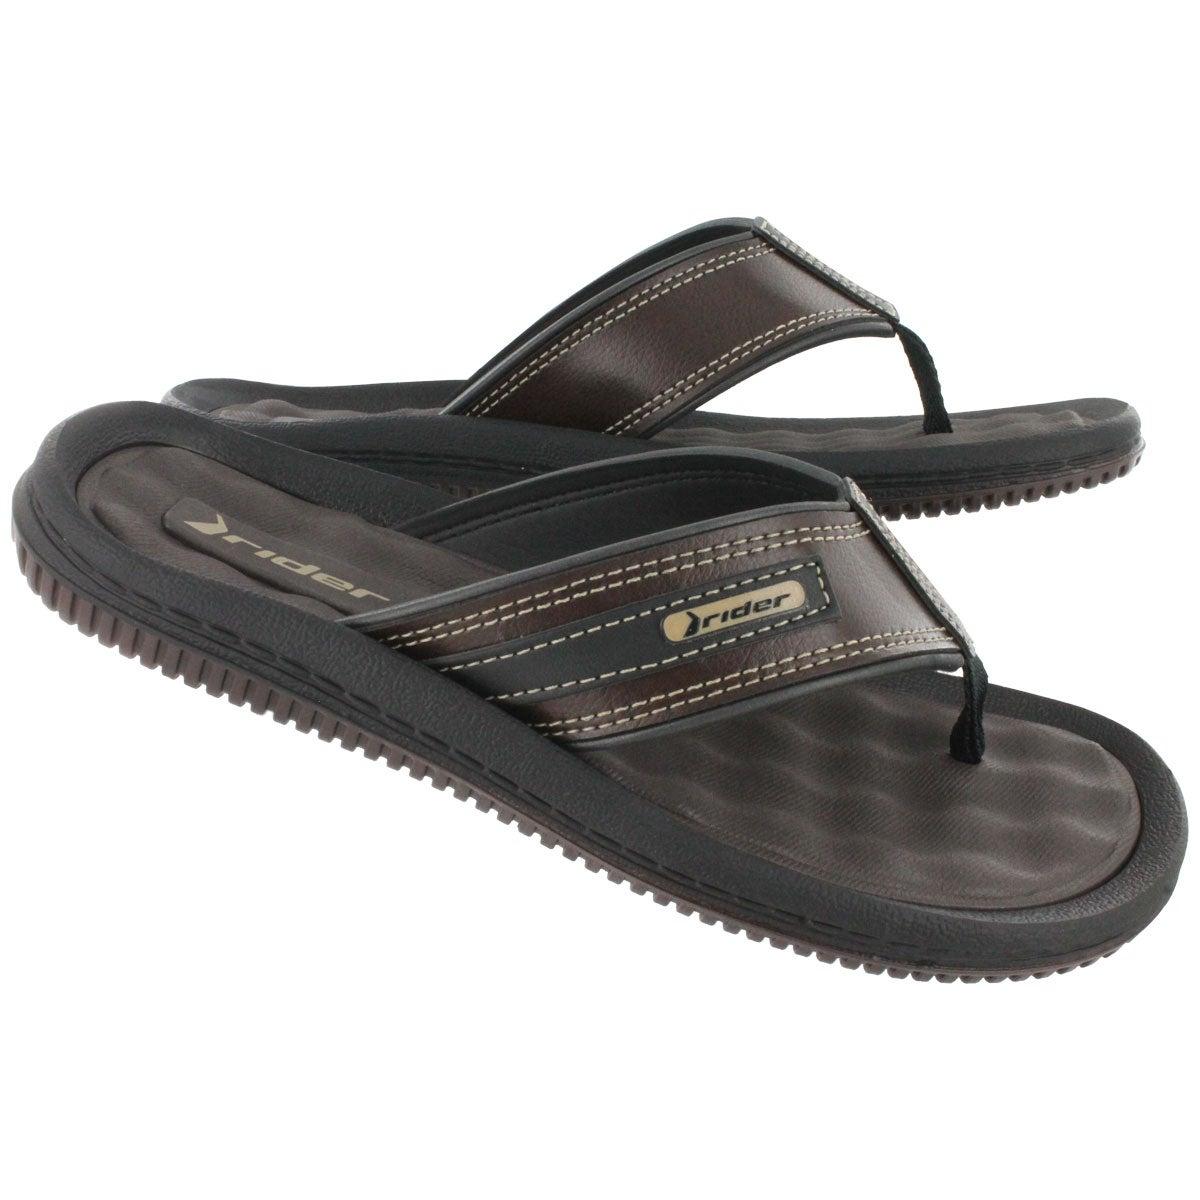 Mns Drift II brown/black flip-flop